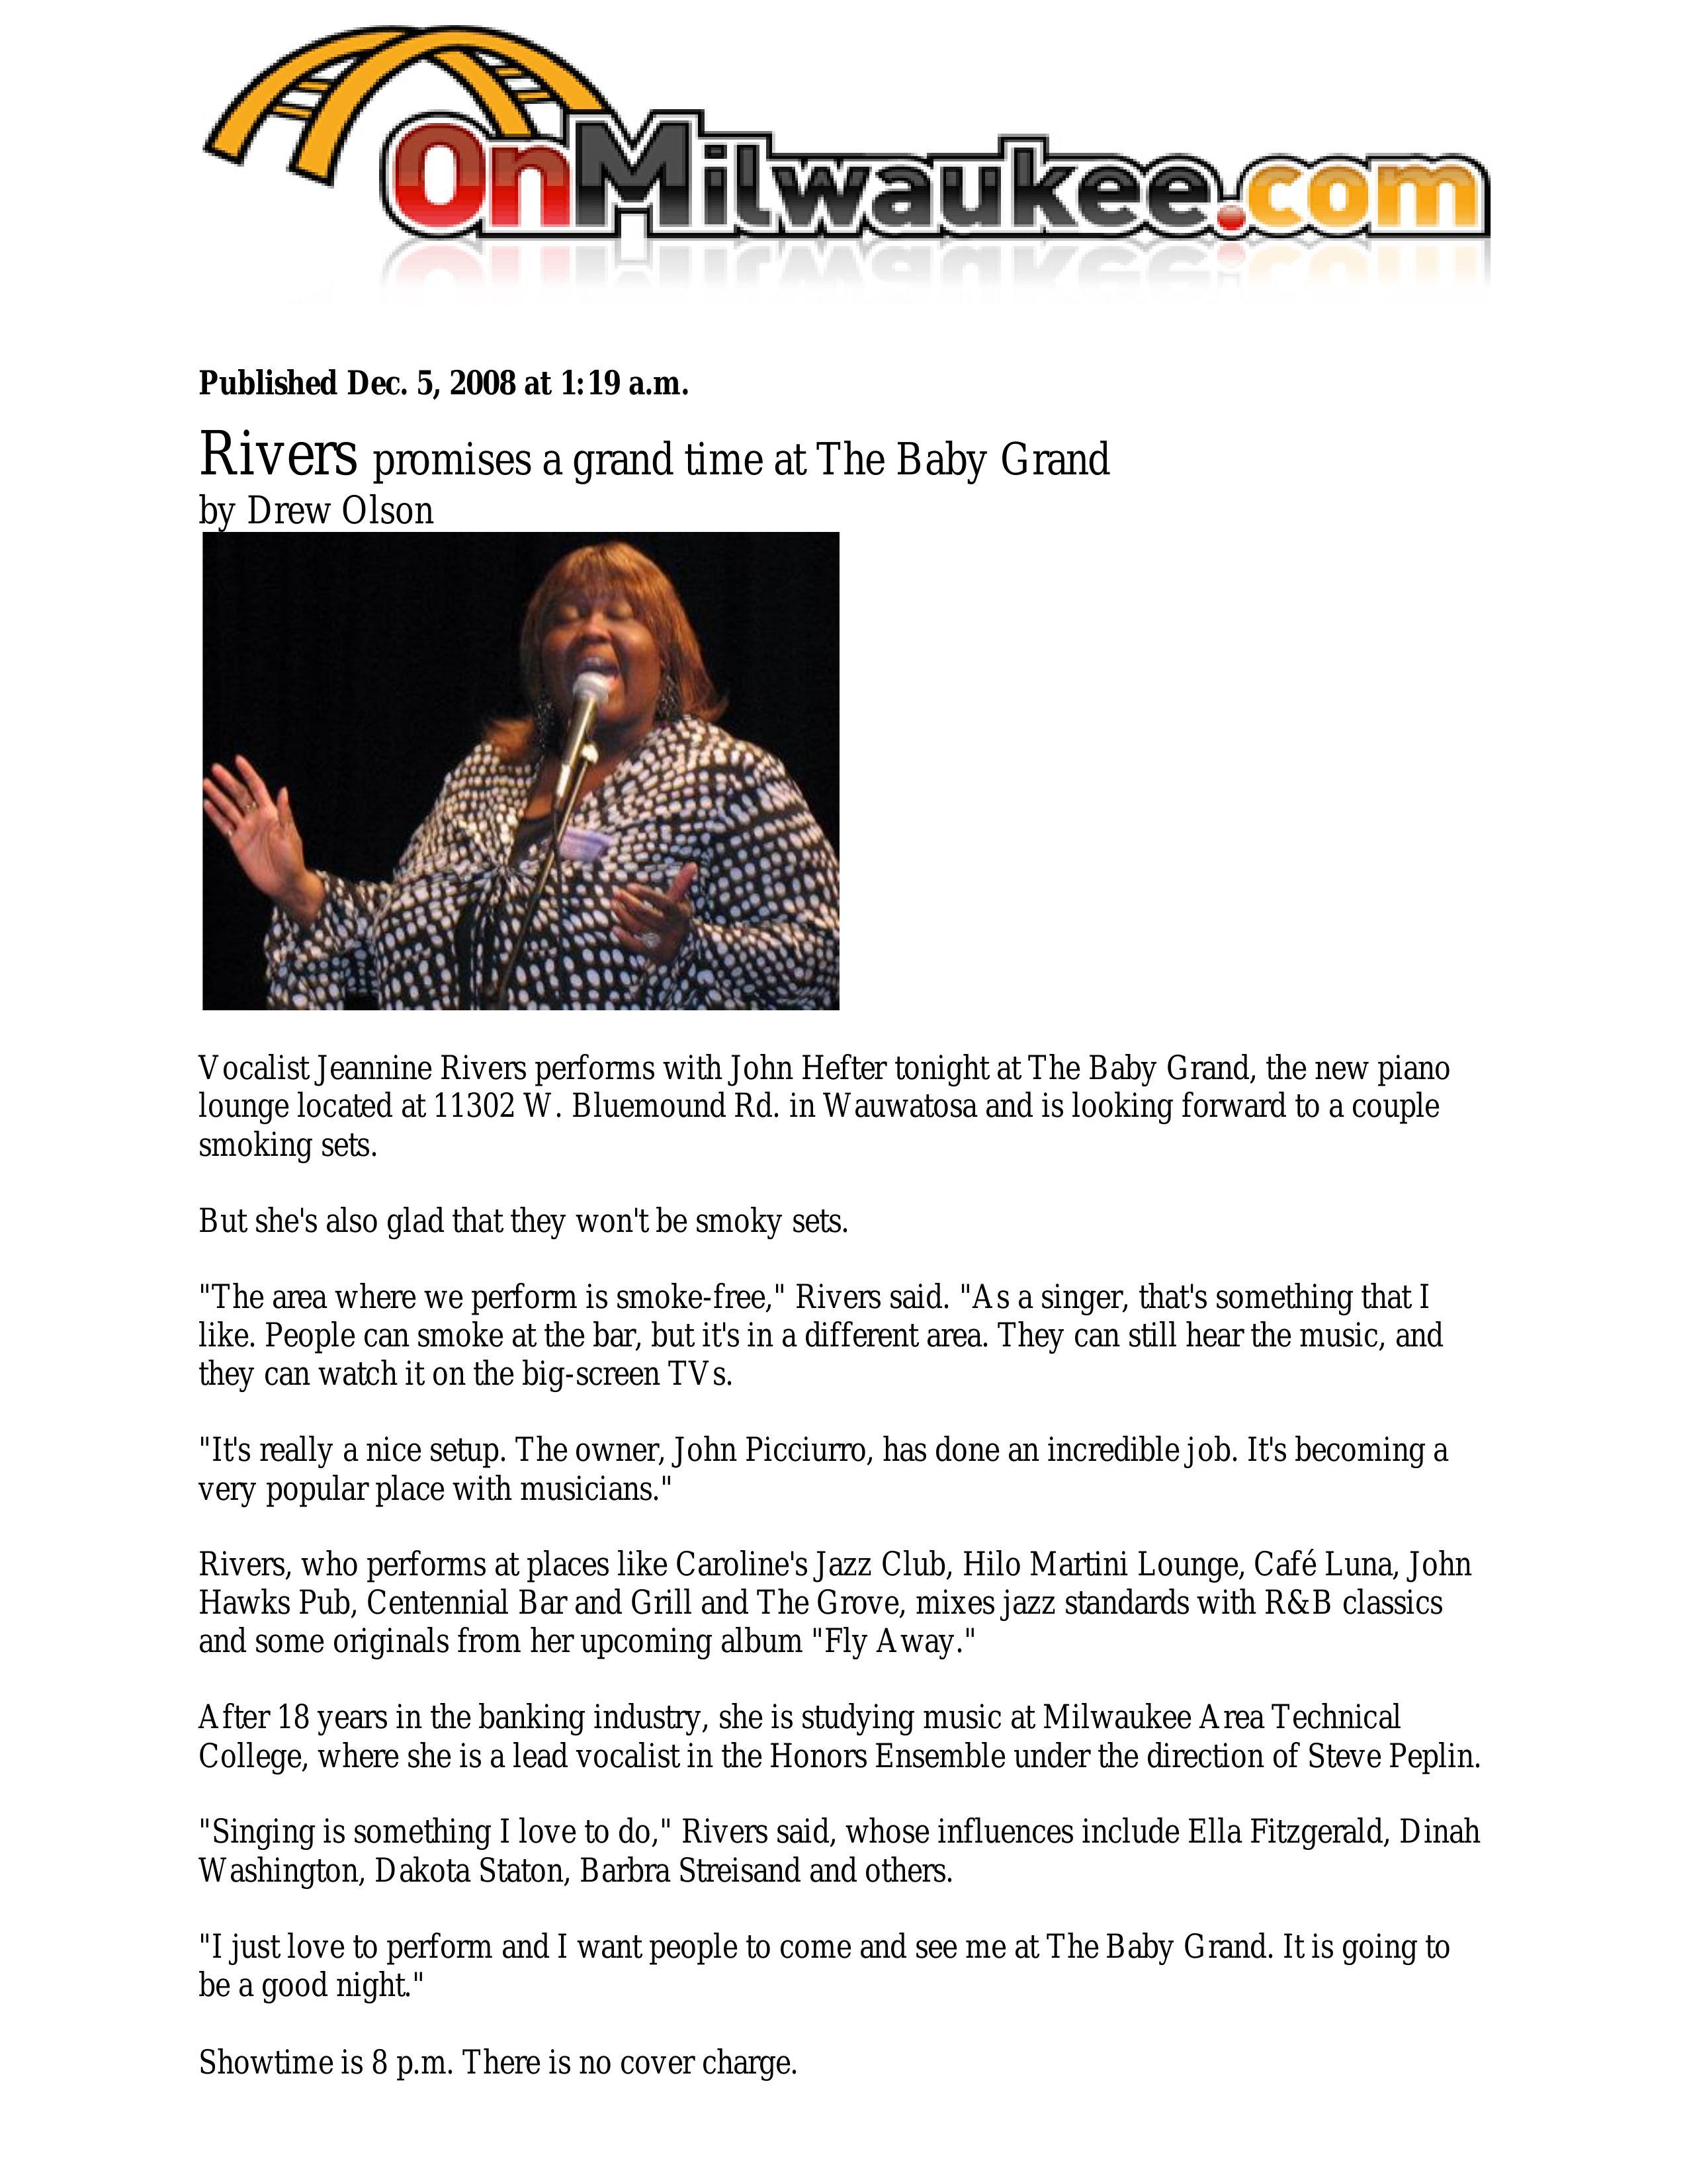 2008 OnMilwaukee Jazz Article